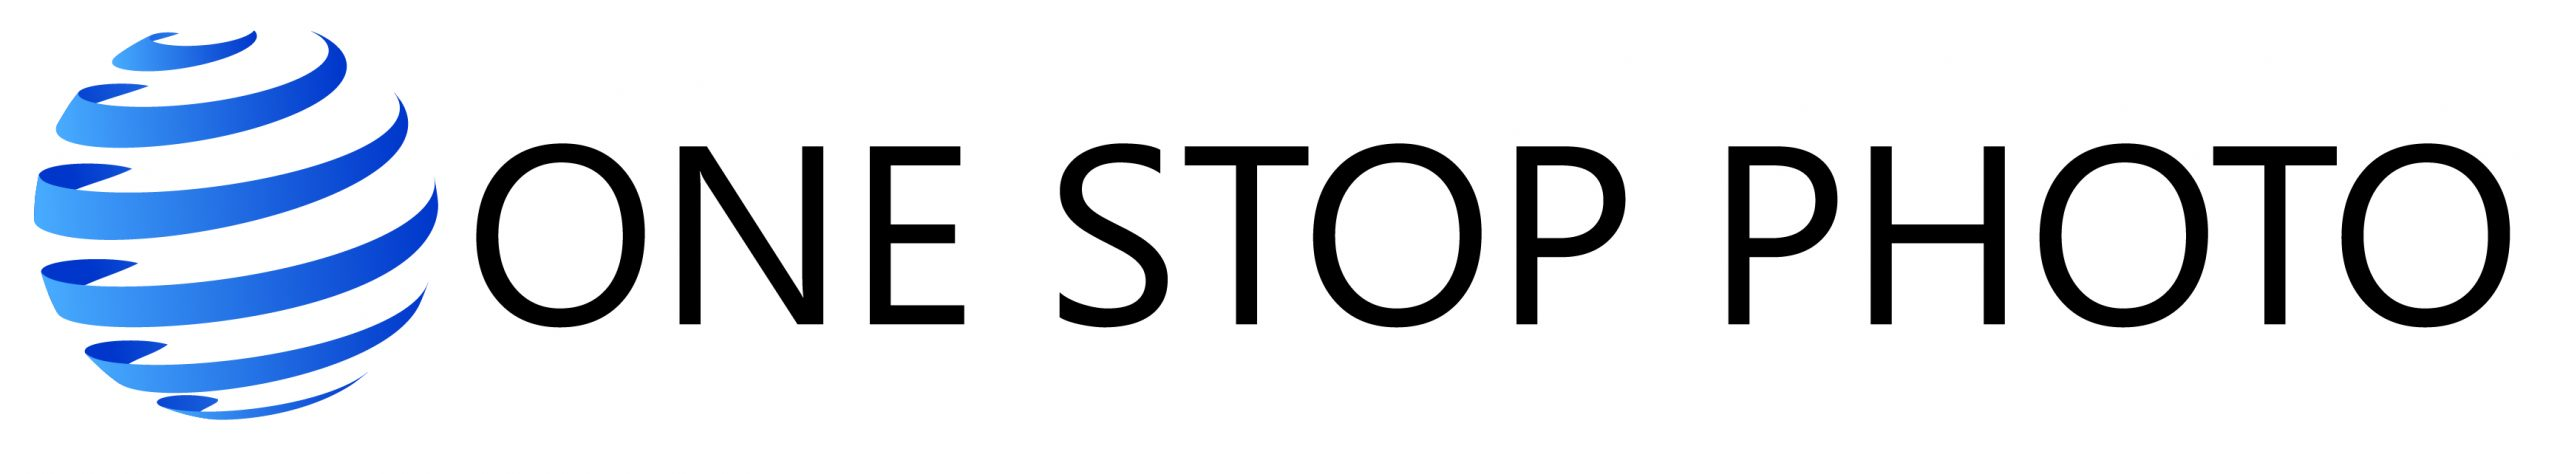 One Stop Photo